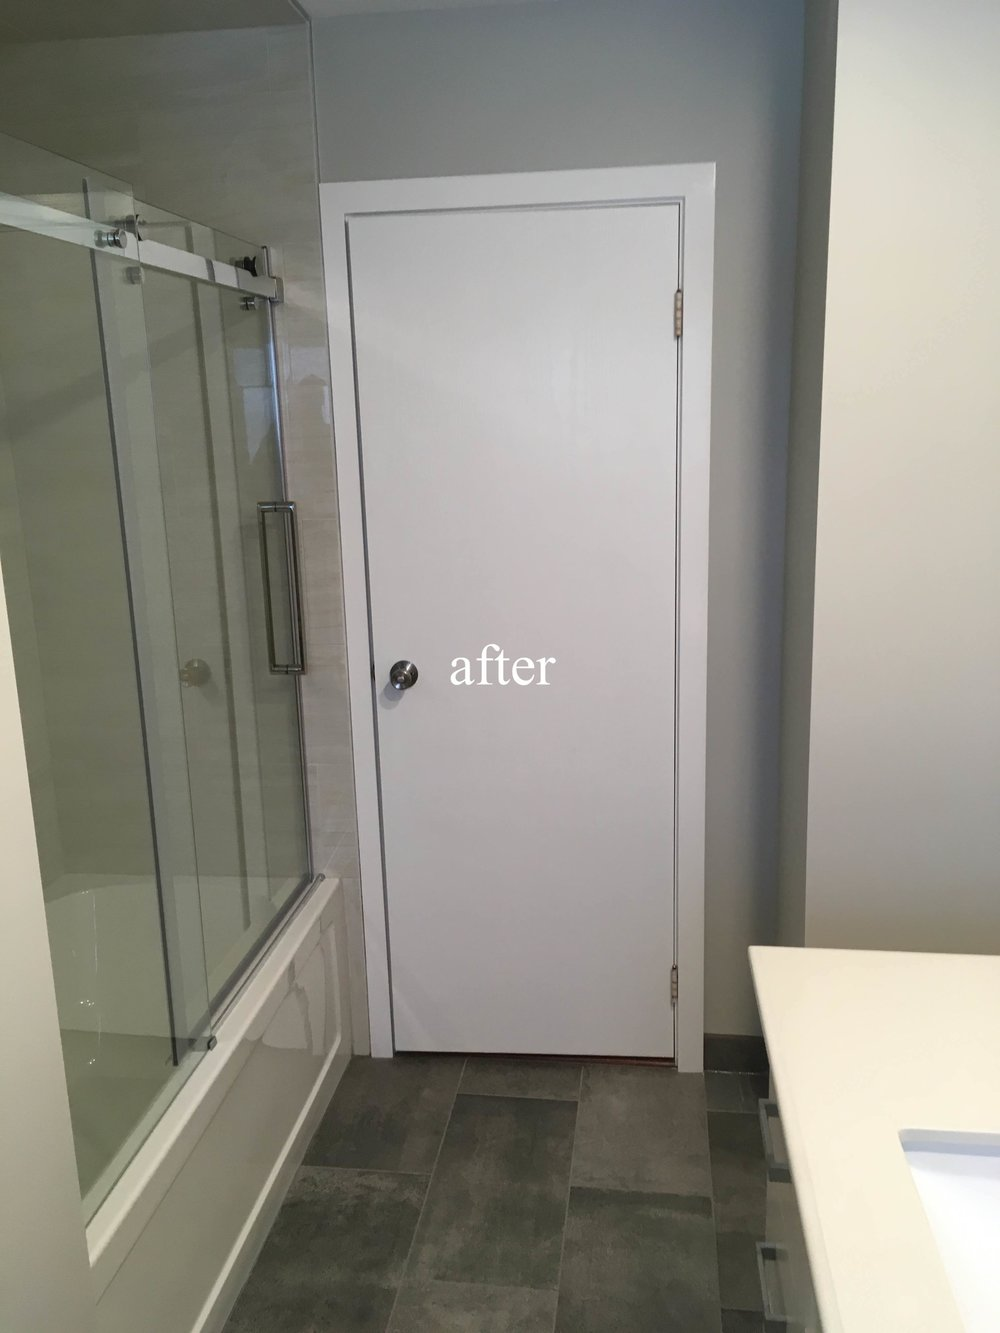 After a bathroom renovation in Kimberley, BC, East Kootenays.